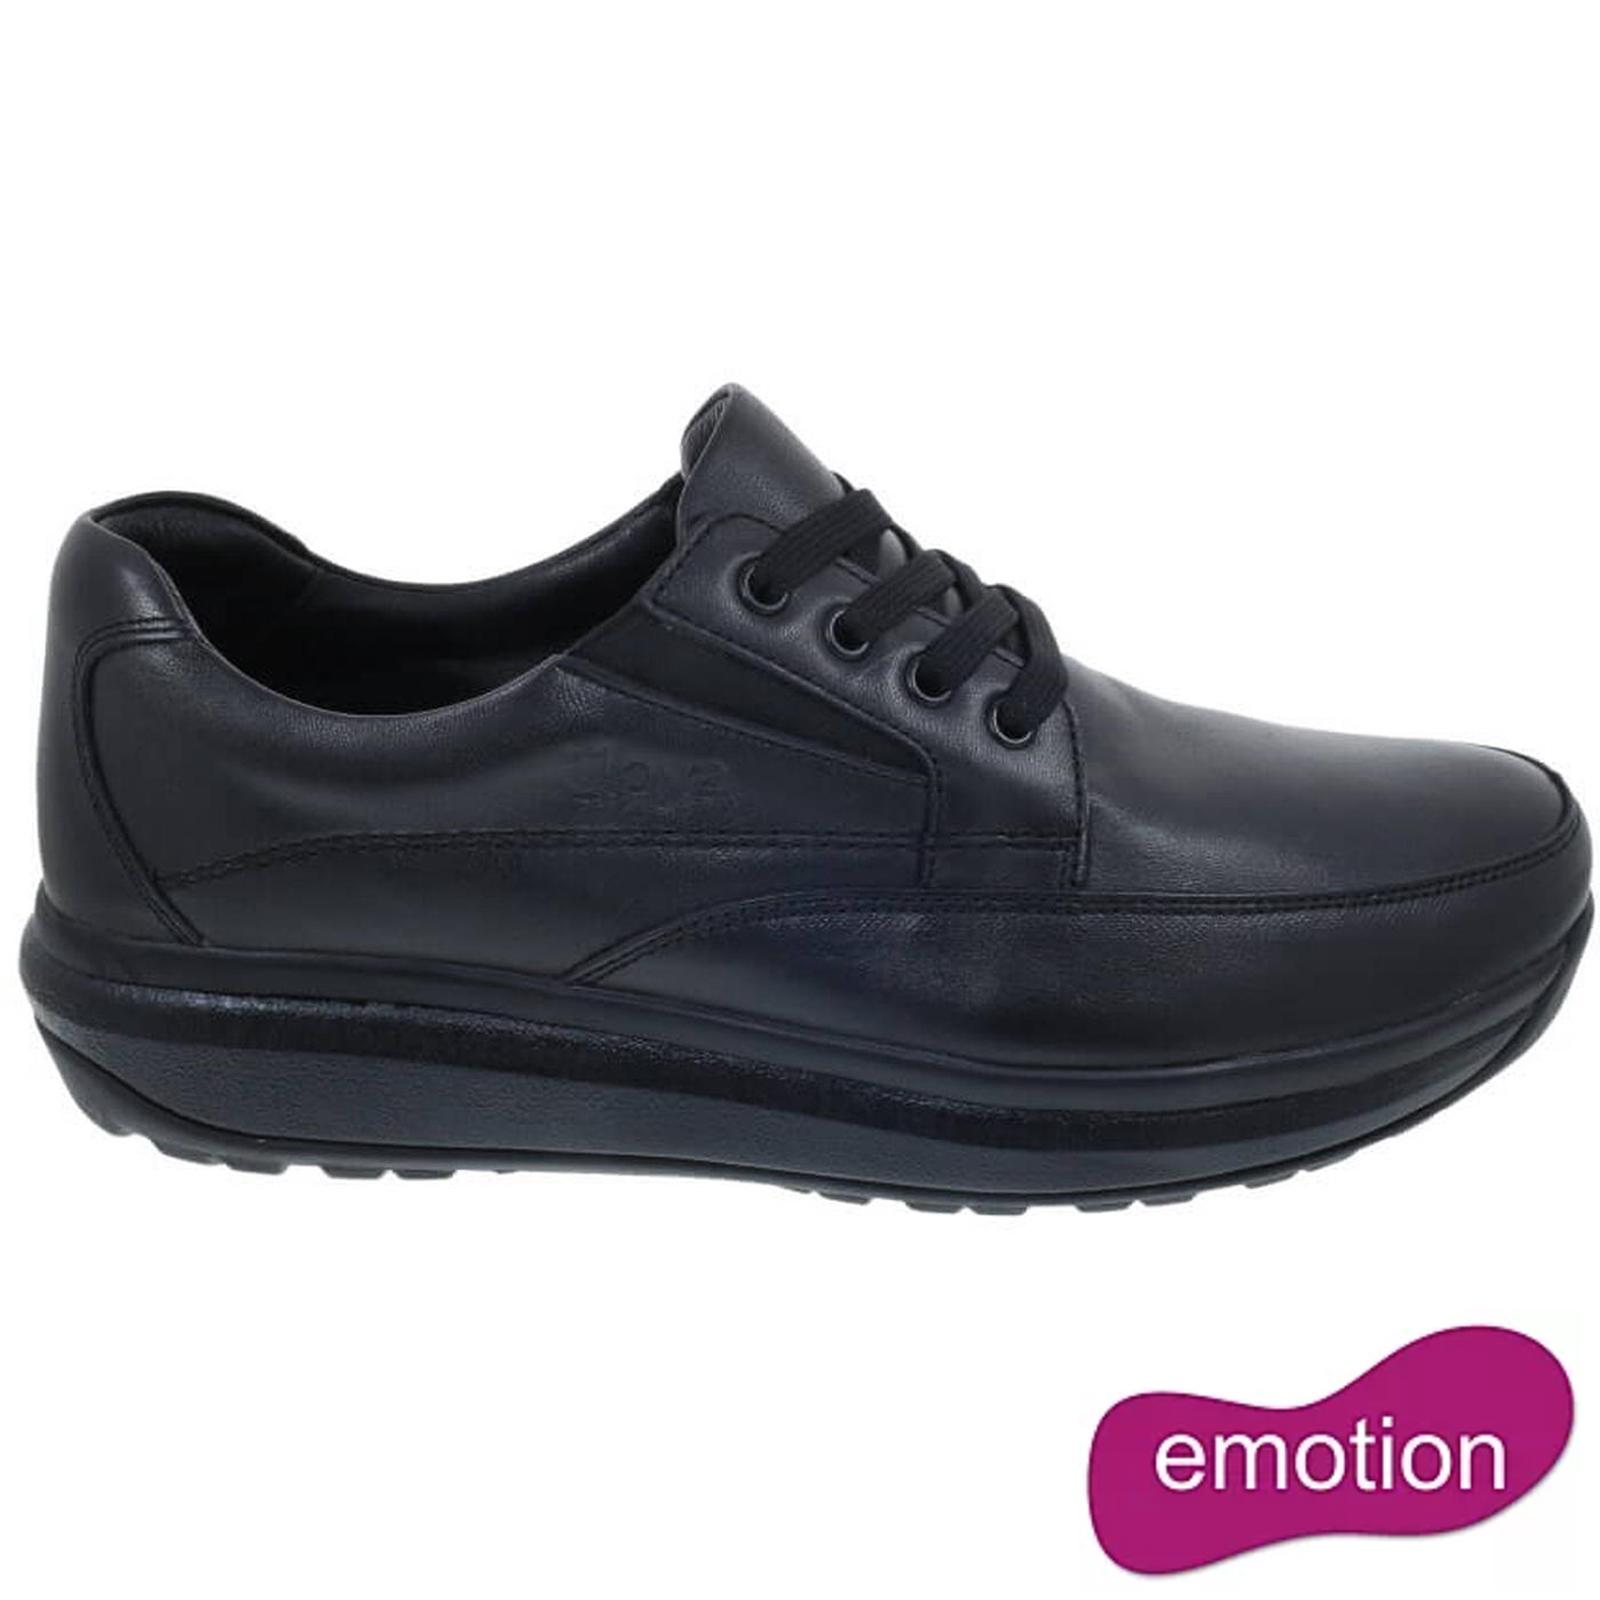 Joya Mens Cruiser II Leather Shoes - Black